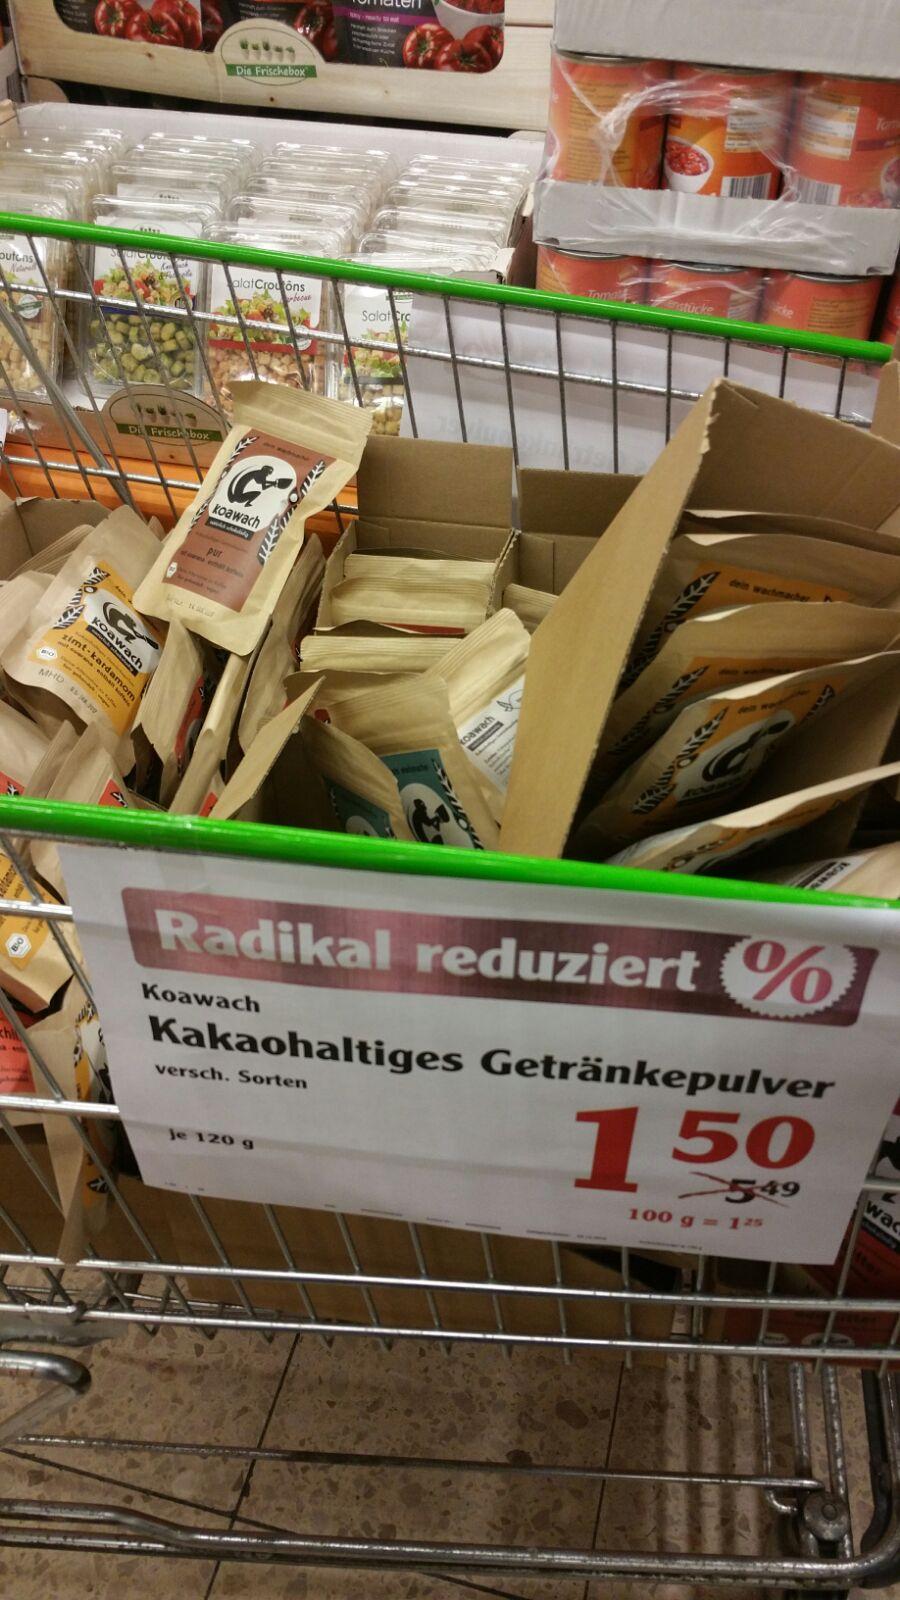 [ Local ] Globus Völklingen - koawach Bio- & Fairtrade Kakaos mit Guarana 1,50 Euro